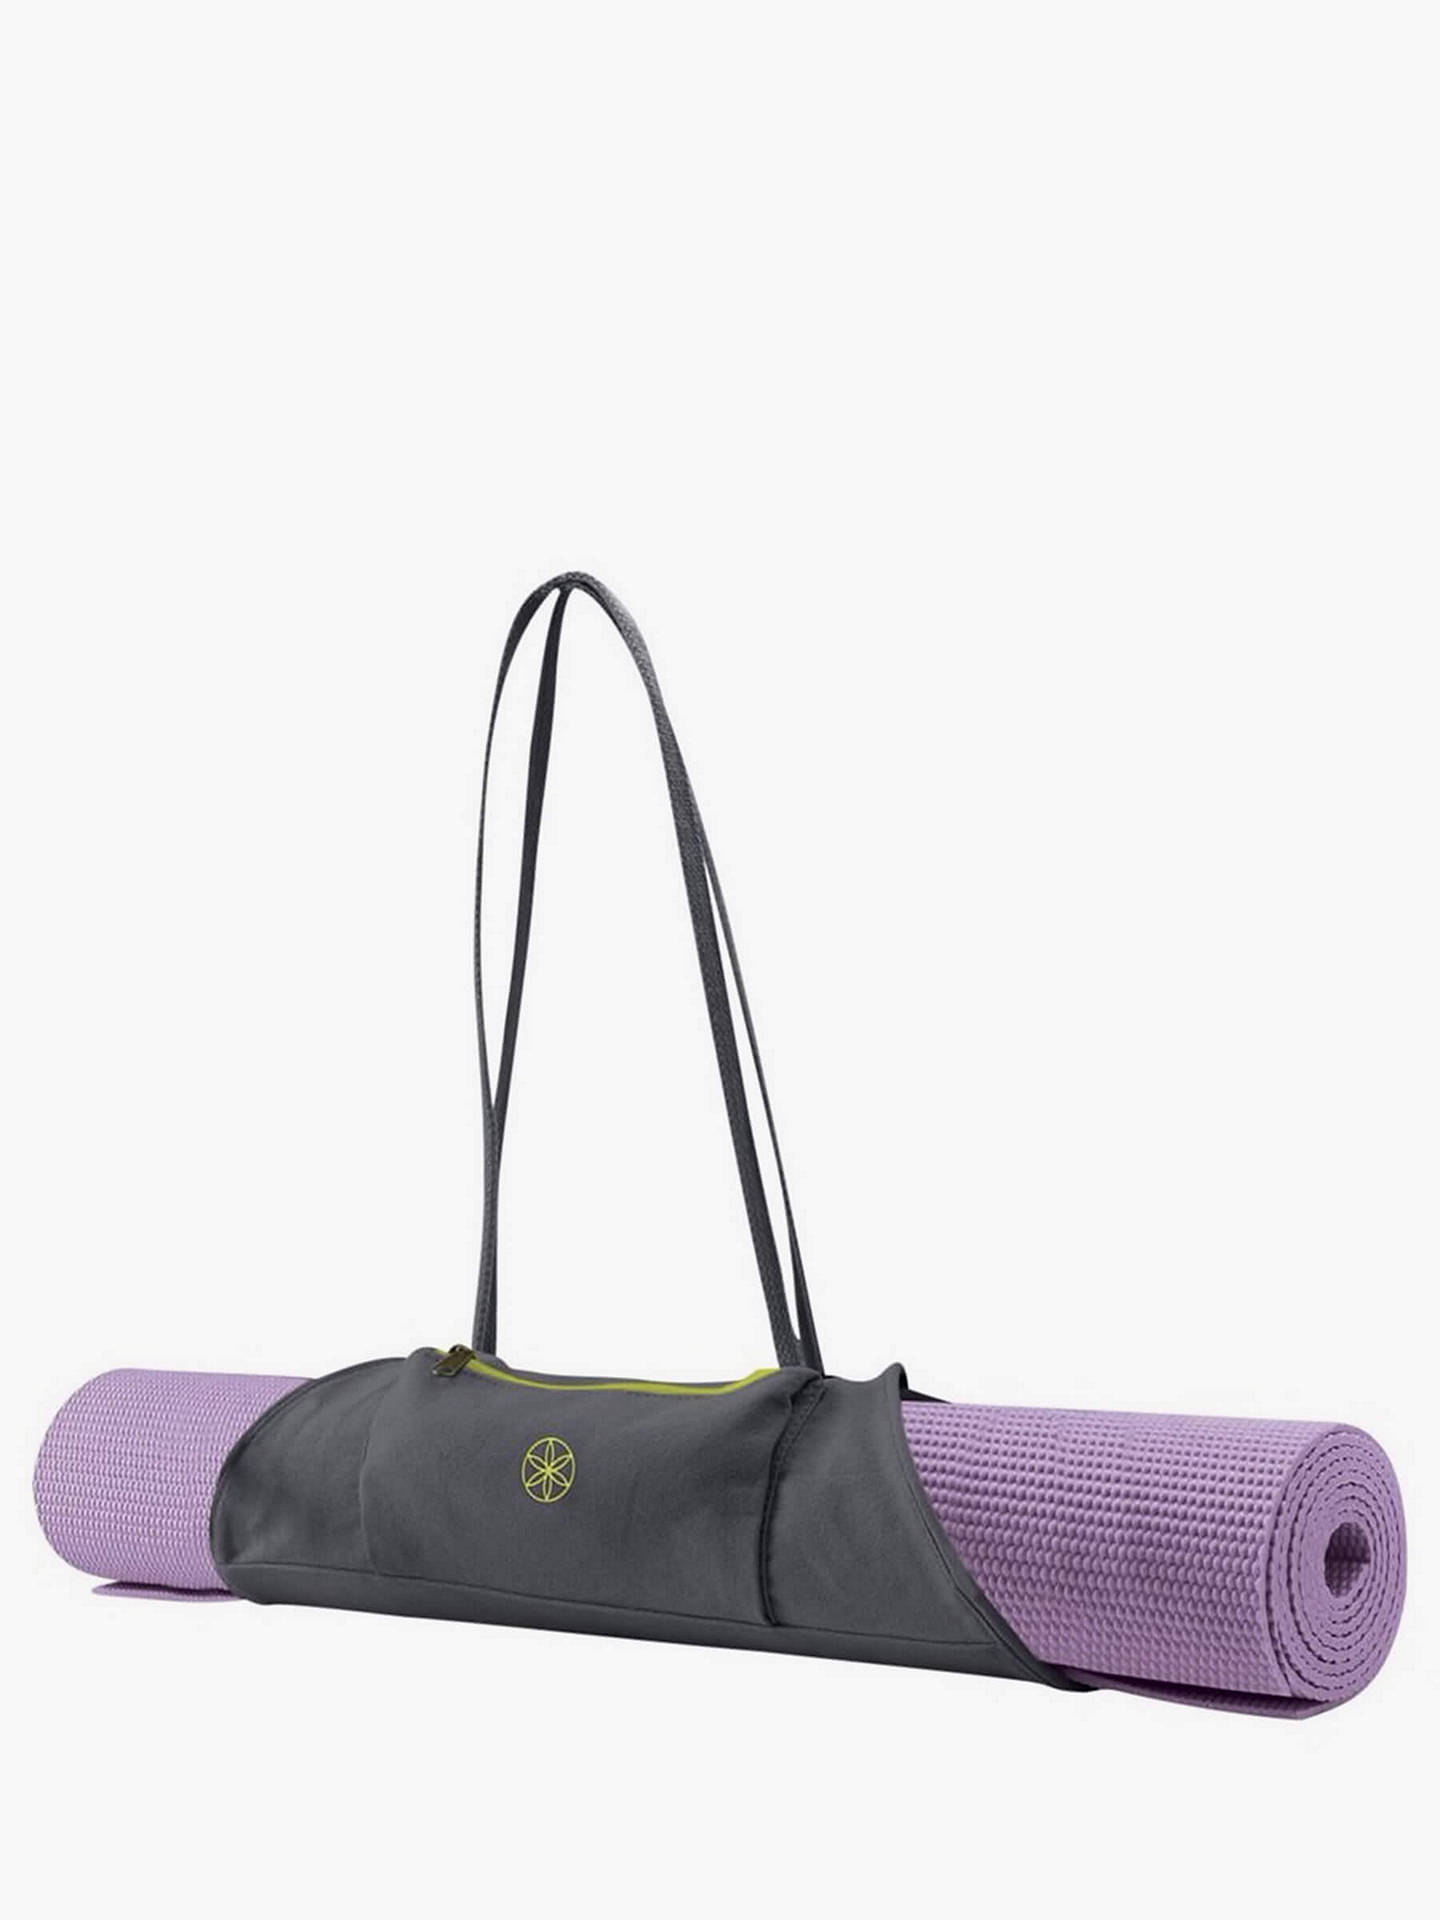 Gaiam On The Go Yoga Mat Carrier Grey Citron At John